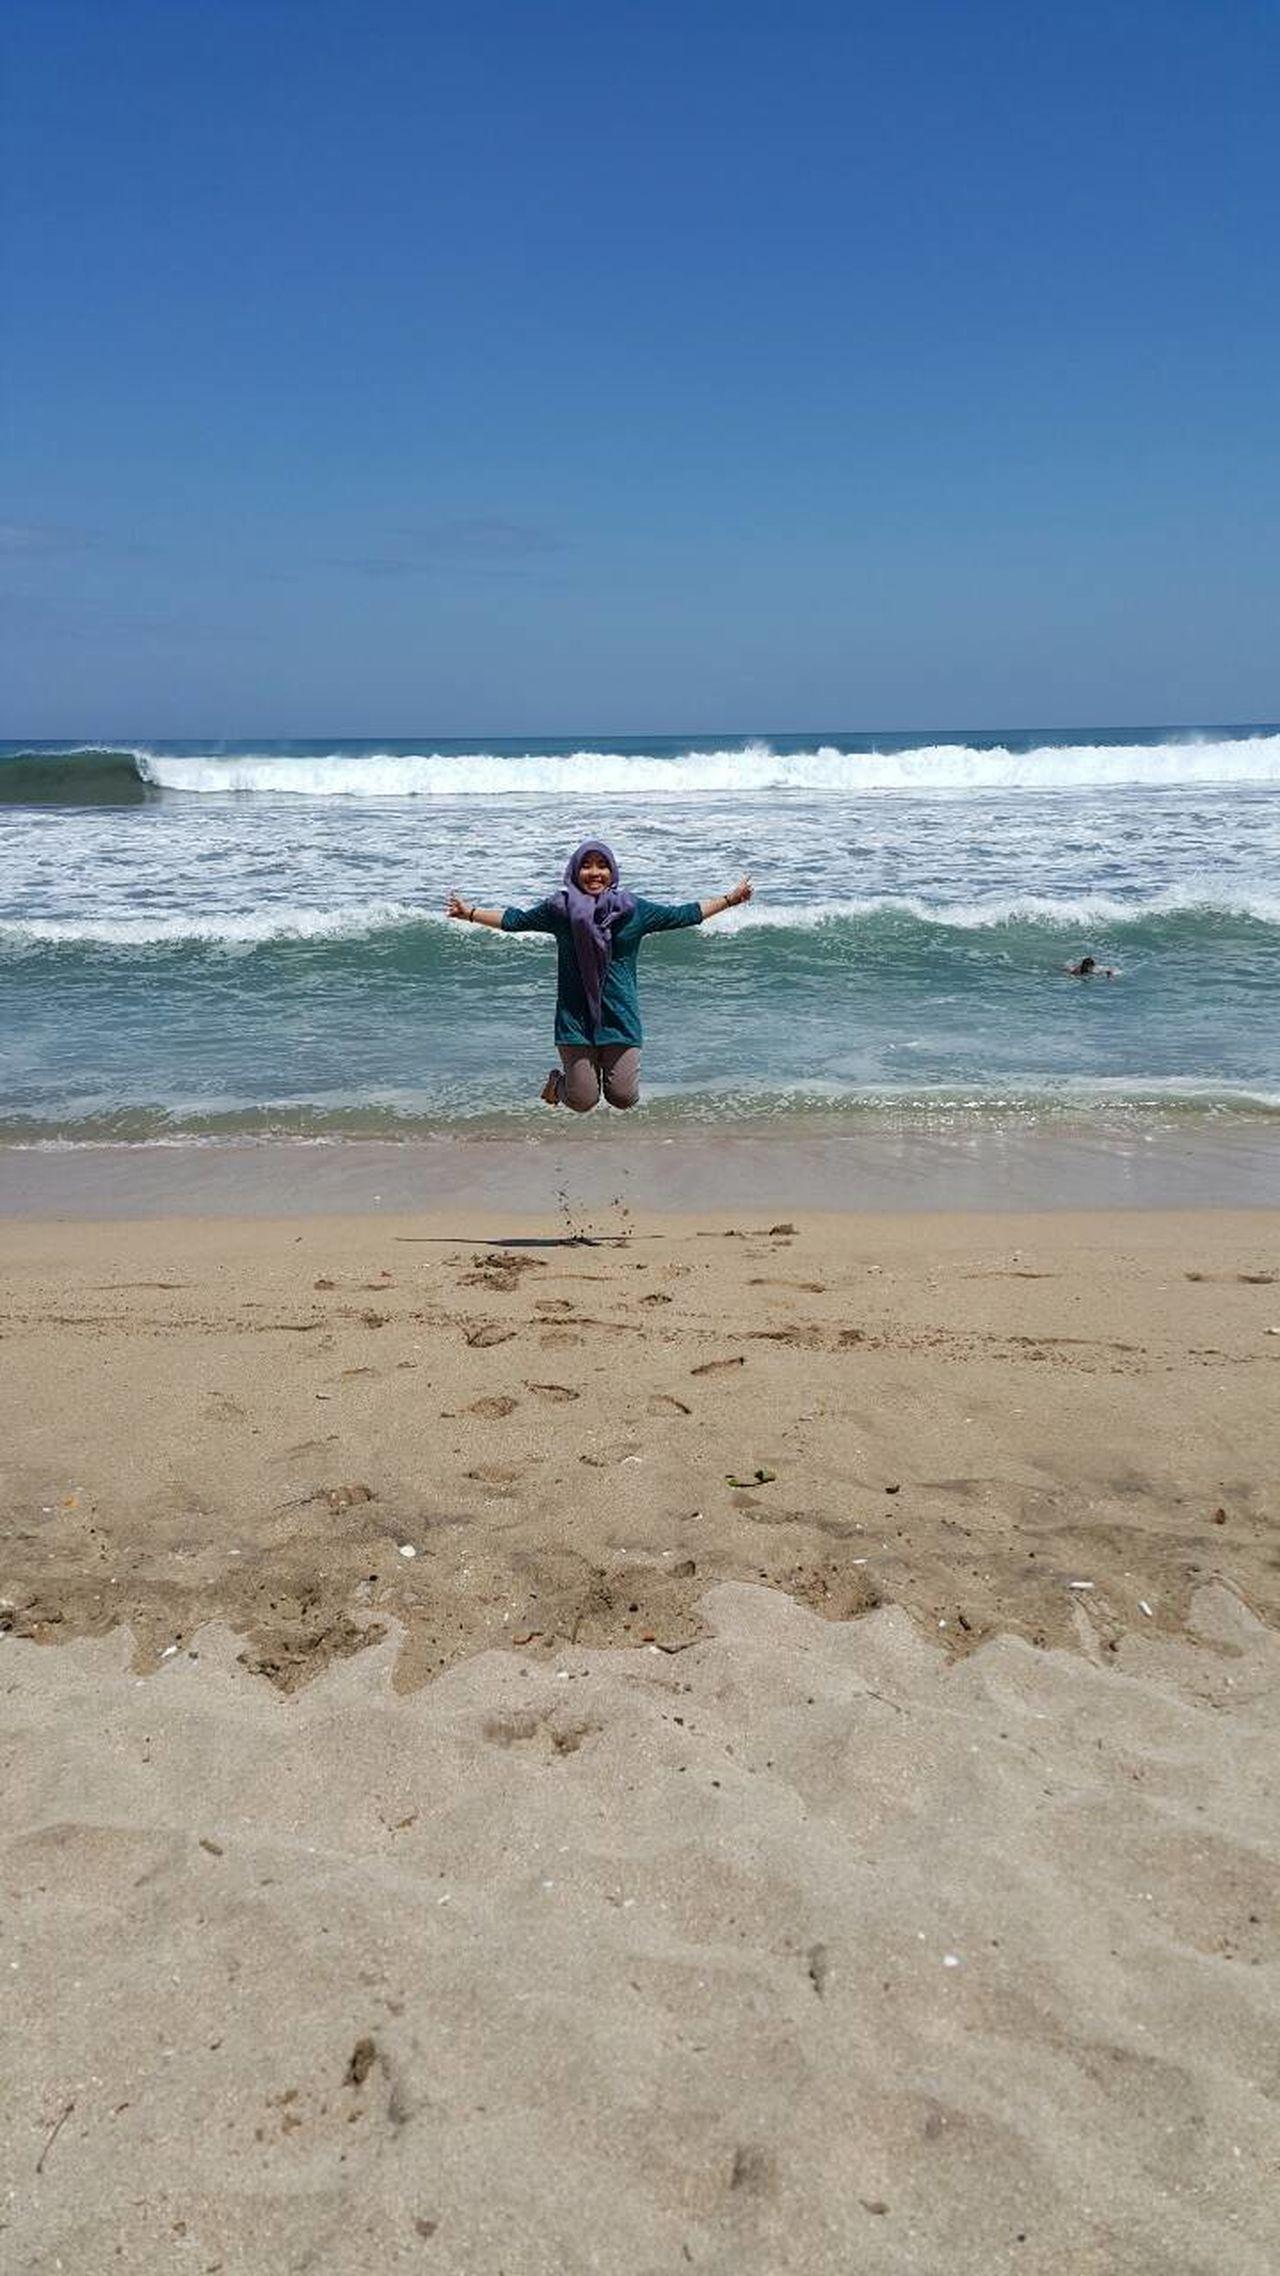 My very successful jumpshot! Taken at Nusa Dua beach, Bali Island, Indonesia. Wonderfulindonesia Beach One Person Wave Nusa Dua Beach Bali, Indonesia Womderful Bali Jumpshot Galaxy Note 4